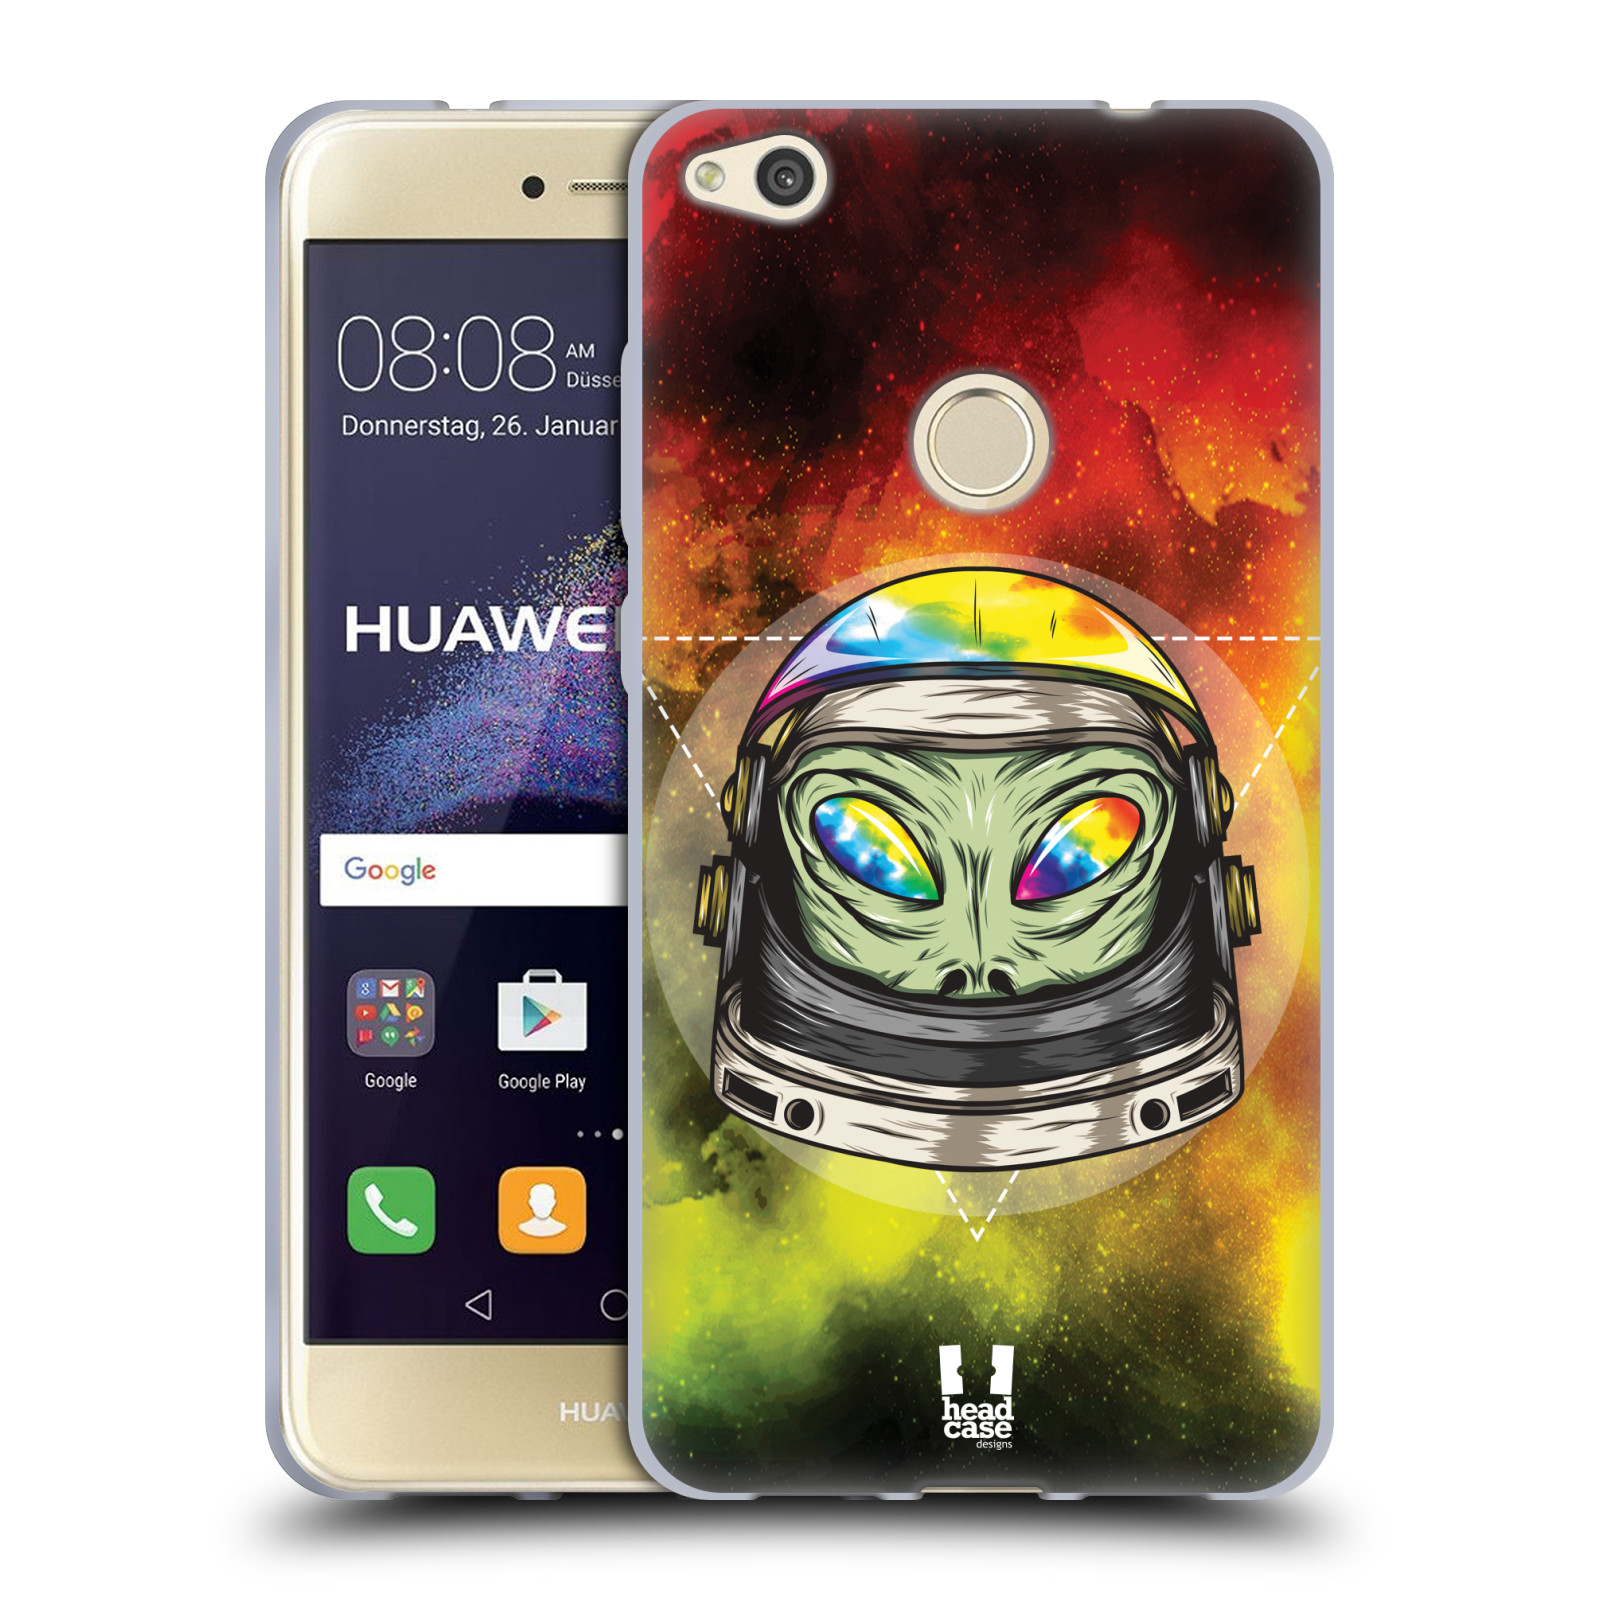 HEAD-CASE-DESIGNS-RAINBOW-ASTRONAUT-SOFT-GEL-CASE-FOR-HUAWEI-P8-LITE-2017